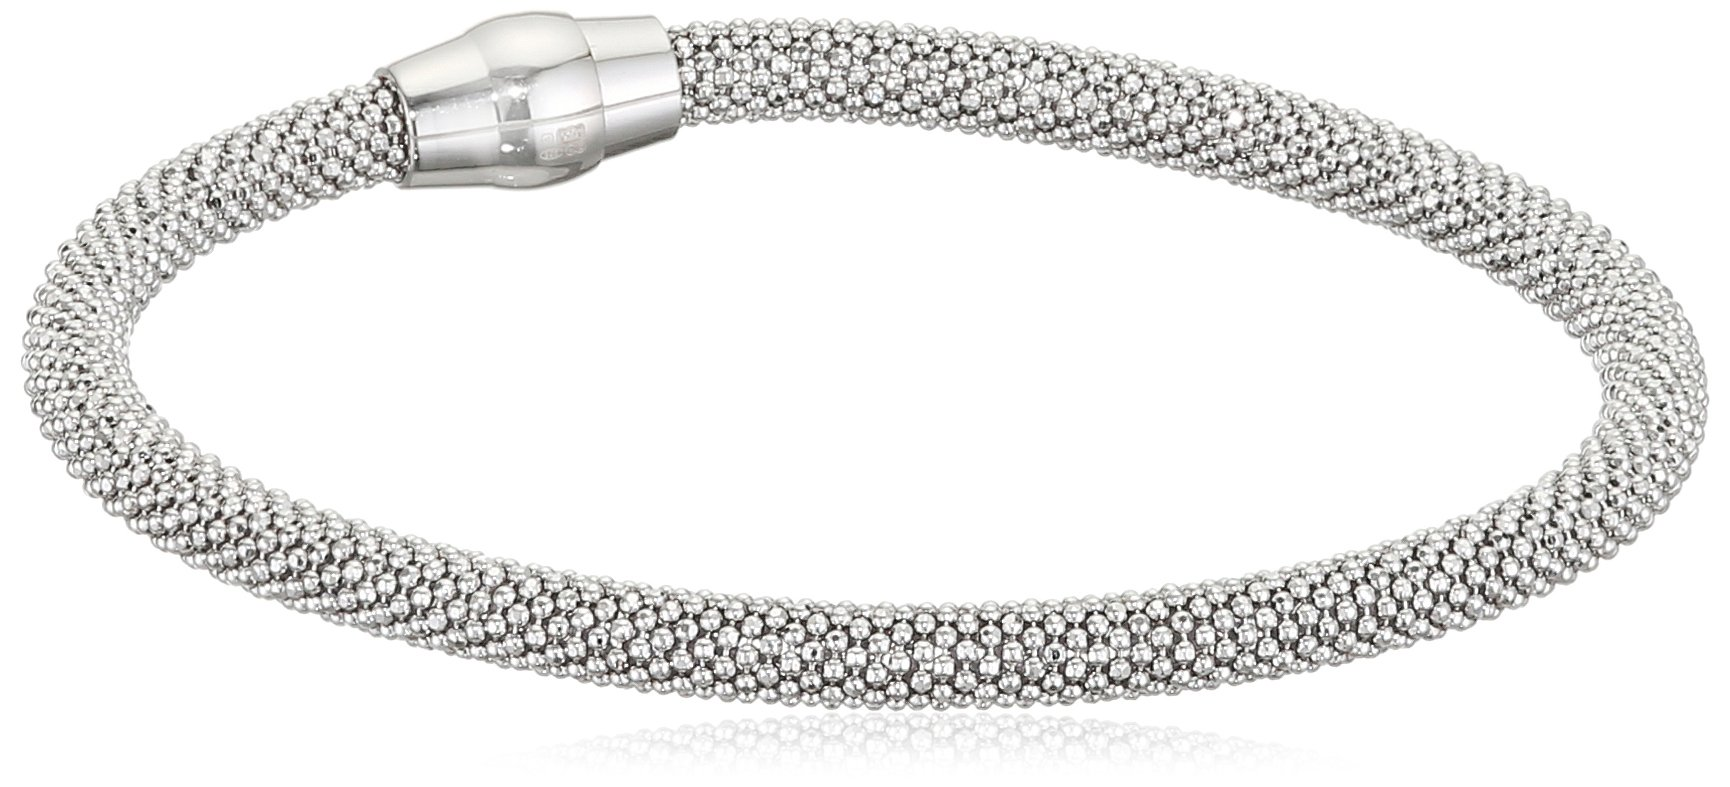 Elements Silver - Bracciale da donna, argento sterling 925, 190 mm, cod. B4174